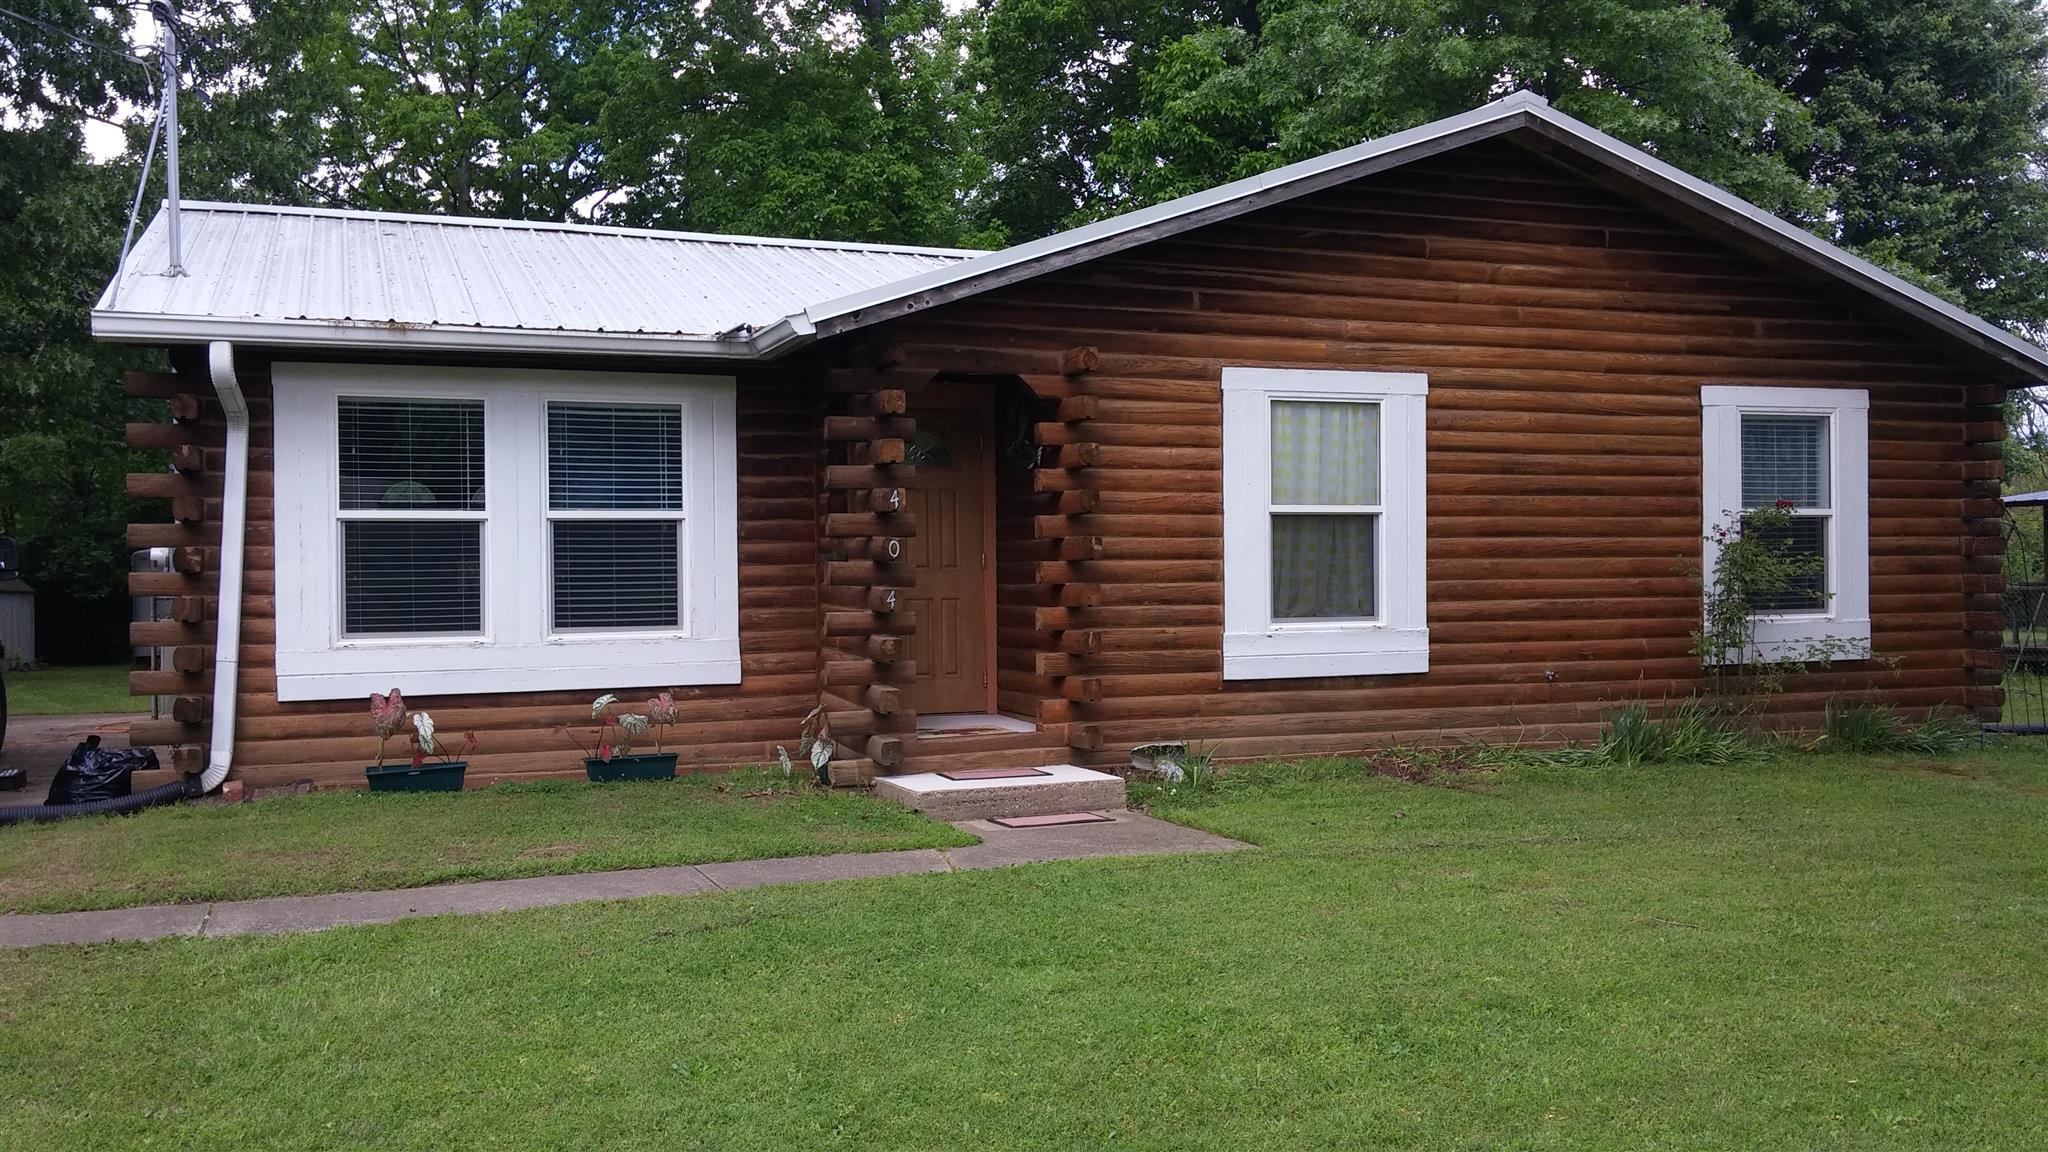 404 Roselawn Dr, Clarksville, TN 37042